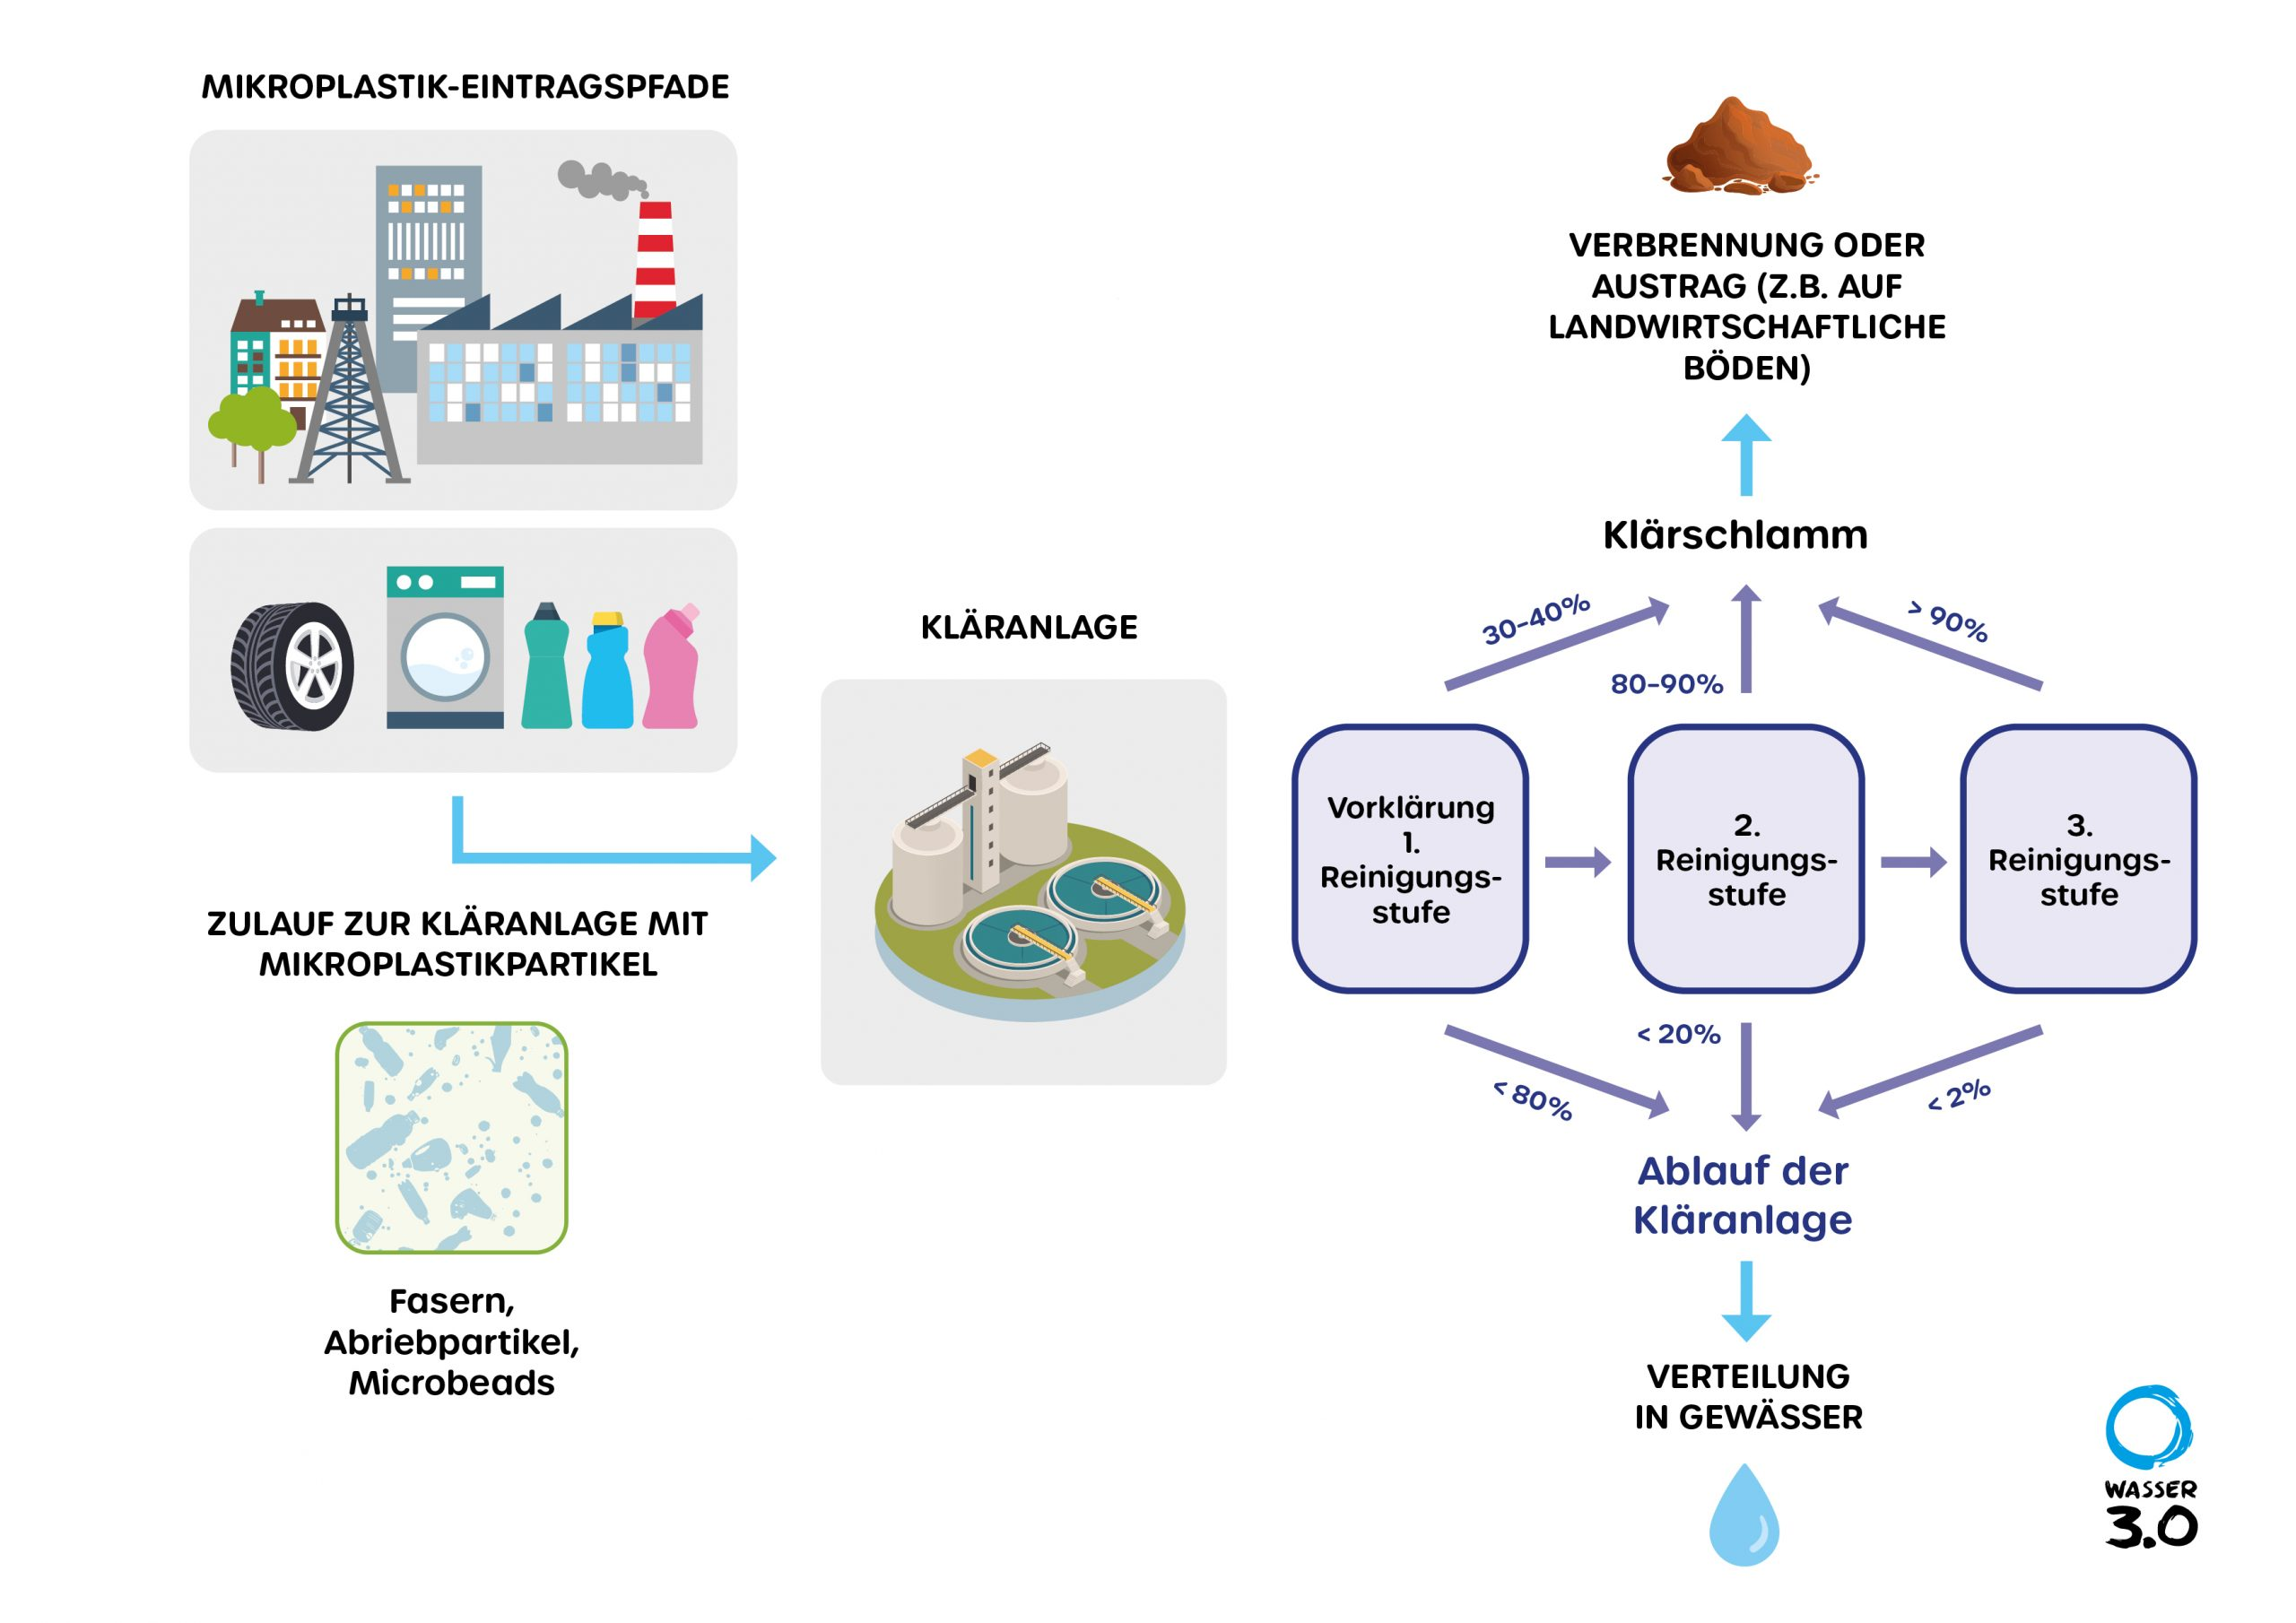 Mikroplastik in Kläranlagen